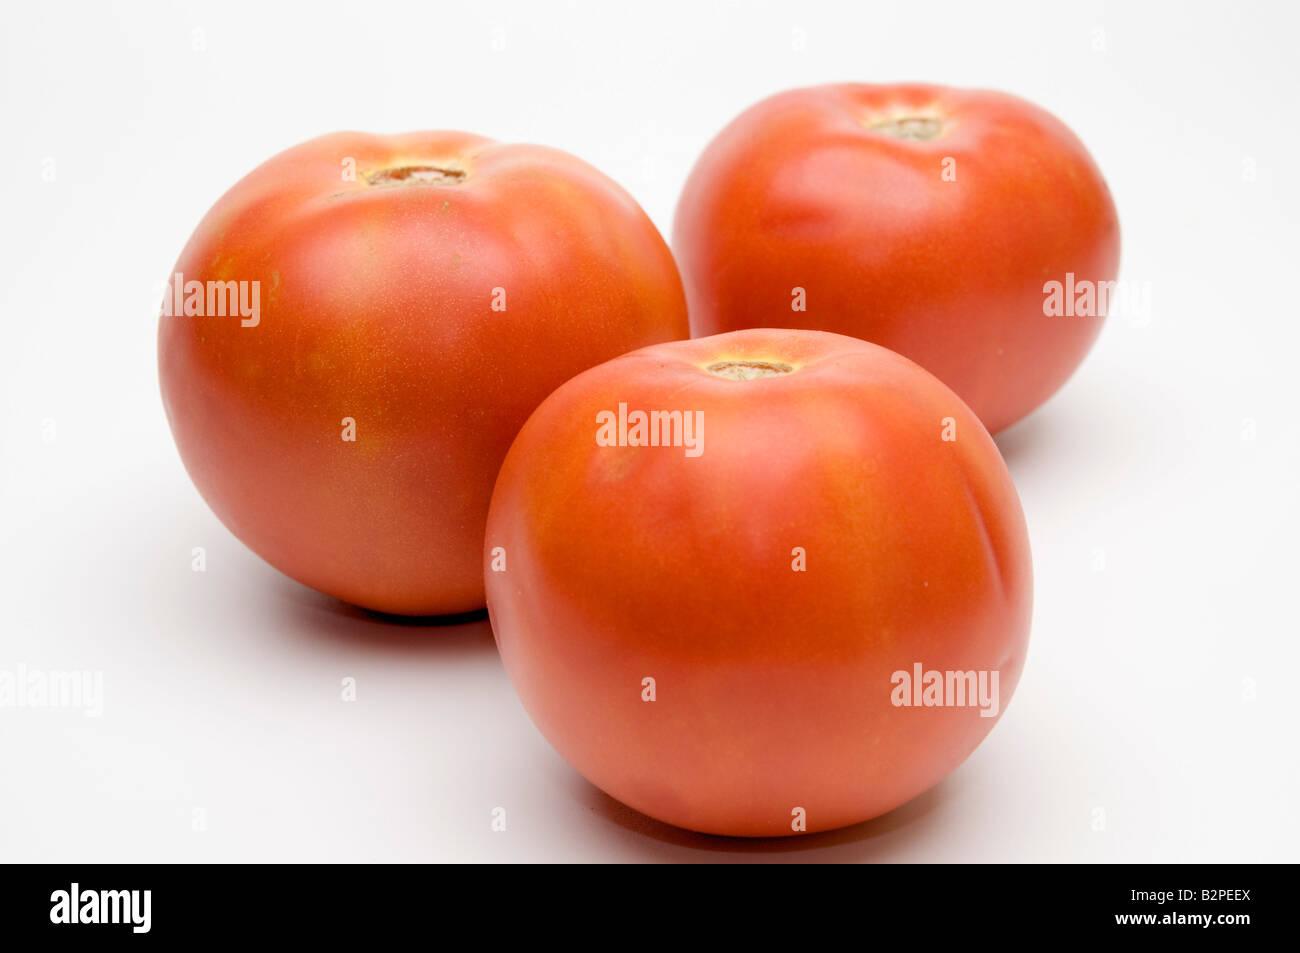 3 fresh ripe Red tomato on white background - Stock Image